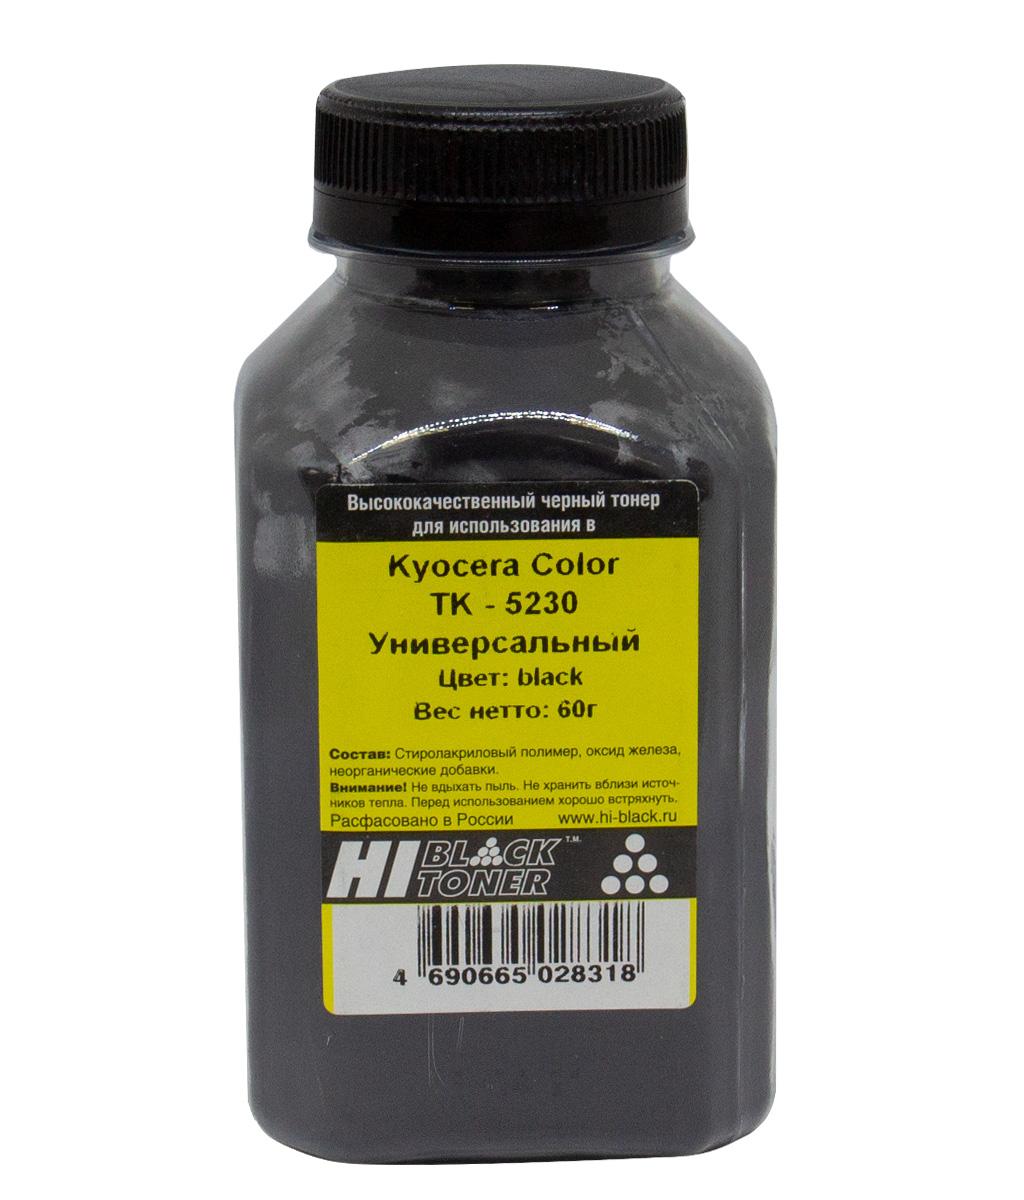 Тонер Hi-Black для Kyocera Color TK-5230K, Bk, 60 г, банка